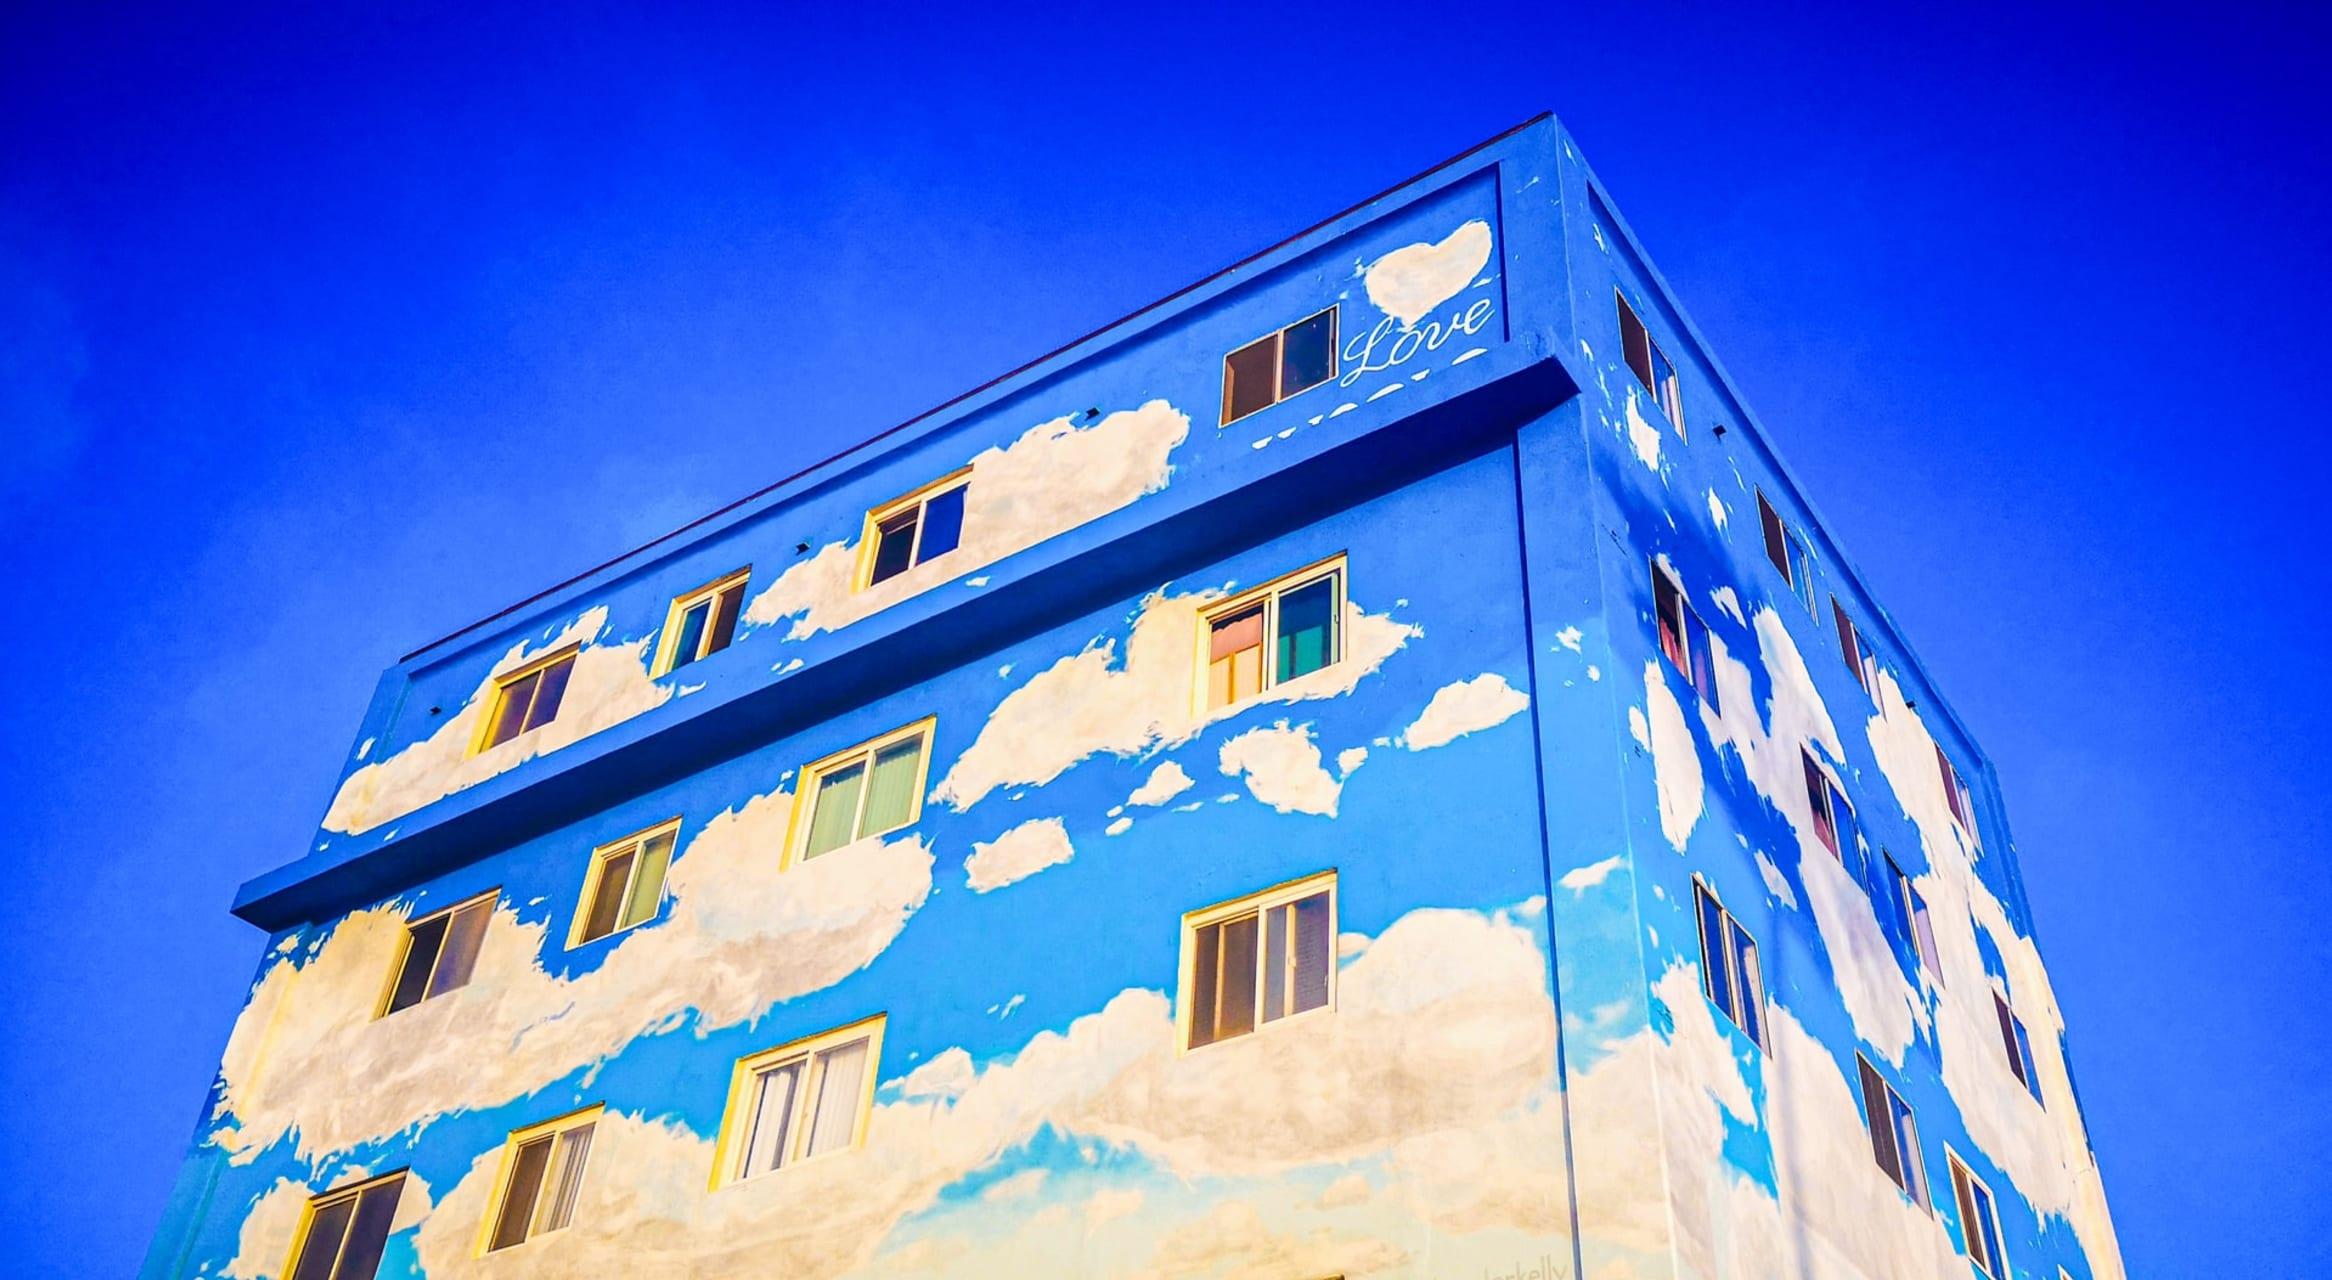 Los Angeles - Venice Beach Murals and Countercultures